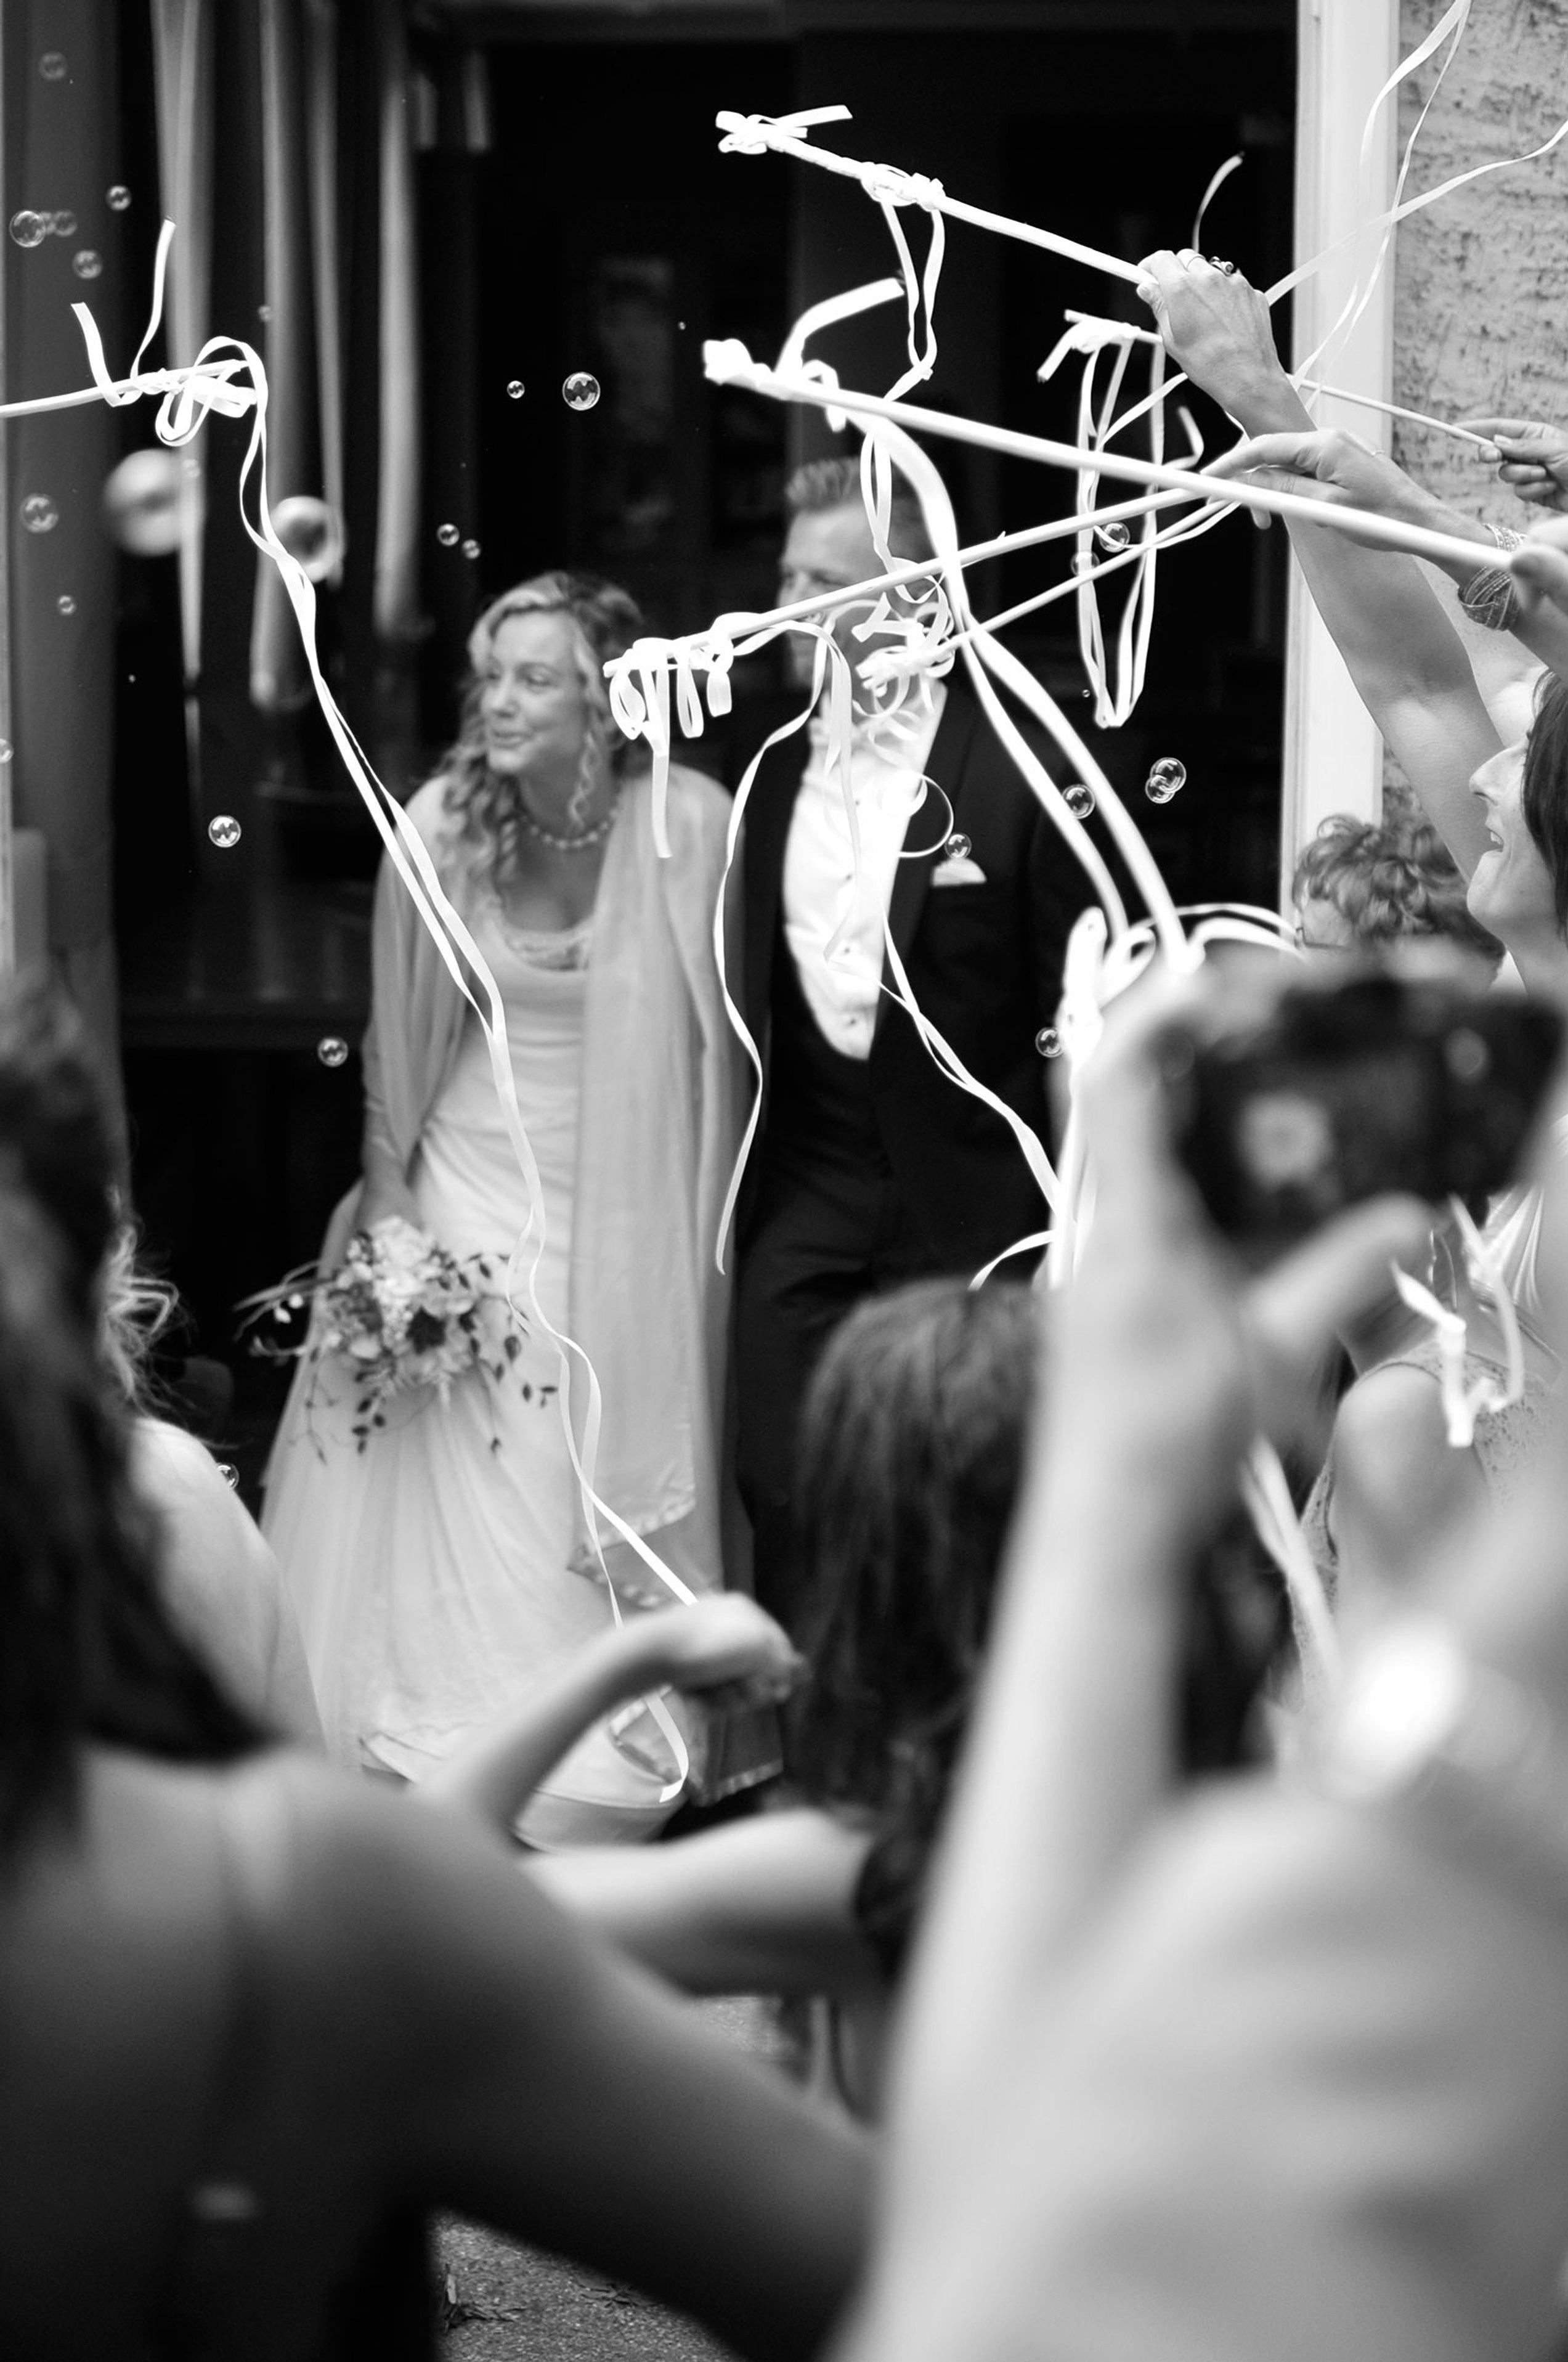 photographe mariage lorientgif - Photographe Mariage Lorient